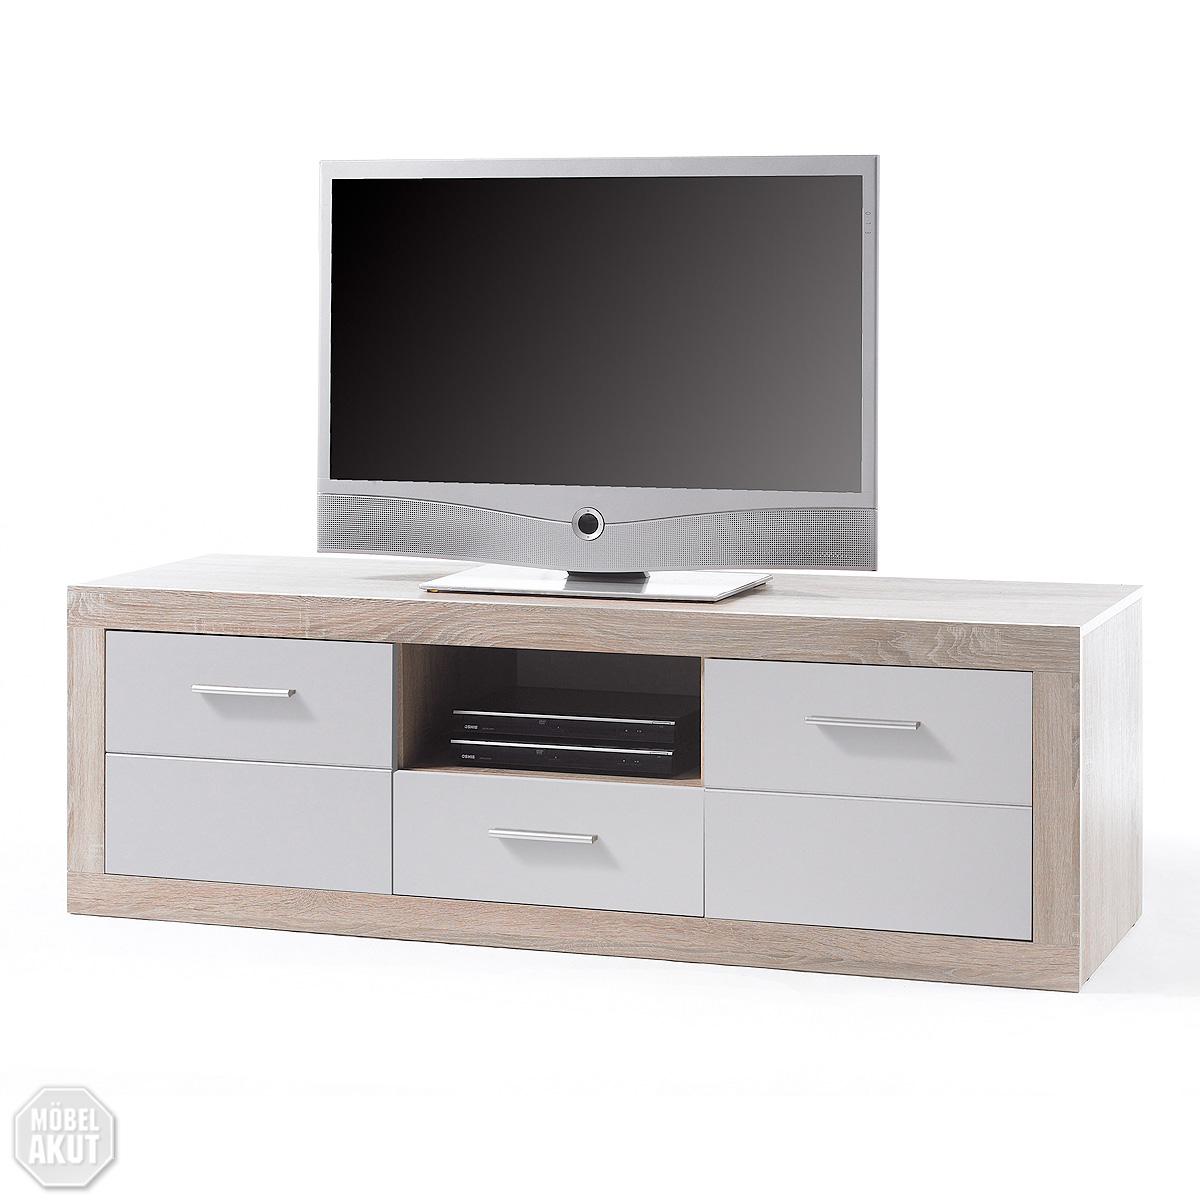 lowboard cancan 7 tv board tv kommode wei sonoma eiche. Black Bedroom Furniture Sets. Home Design Ideas